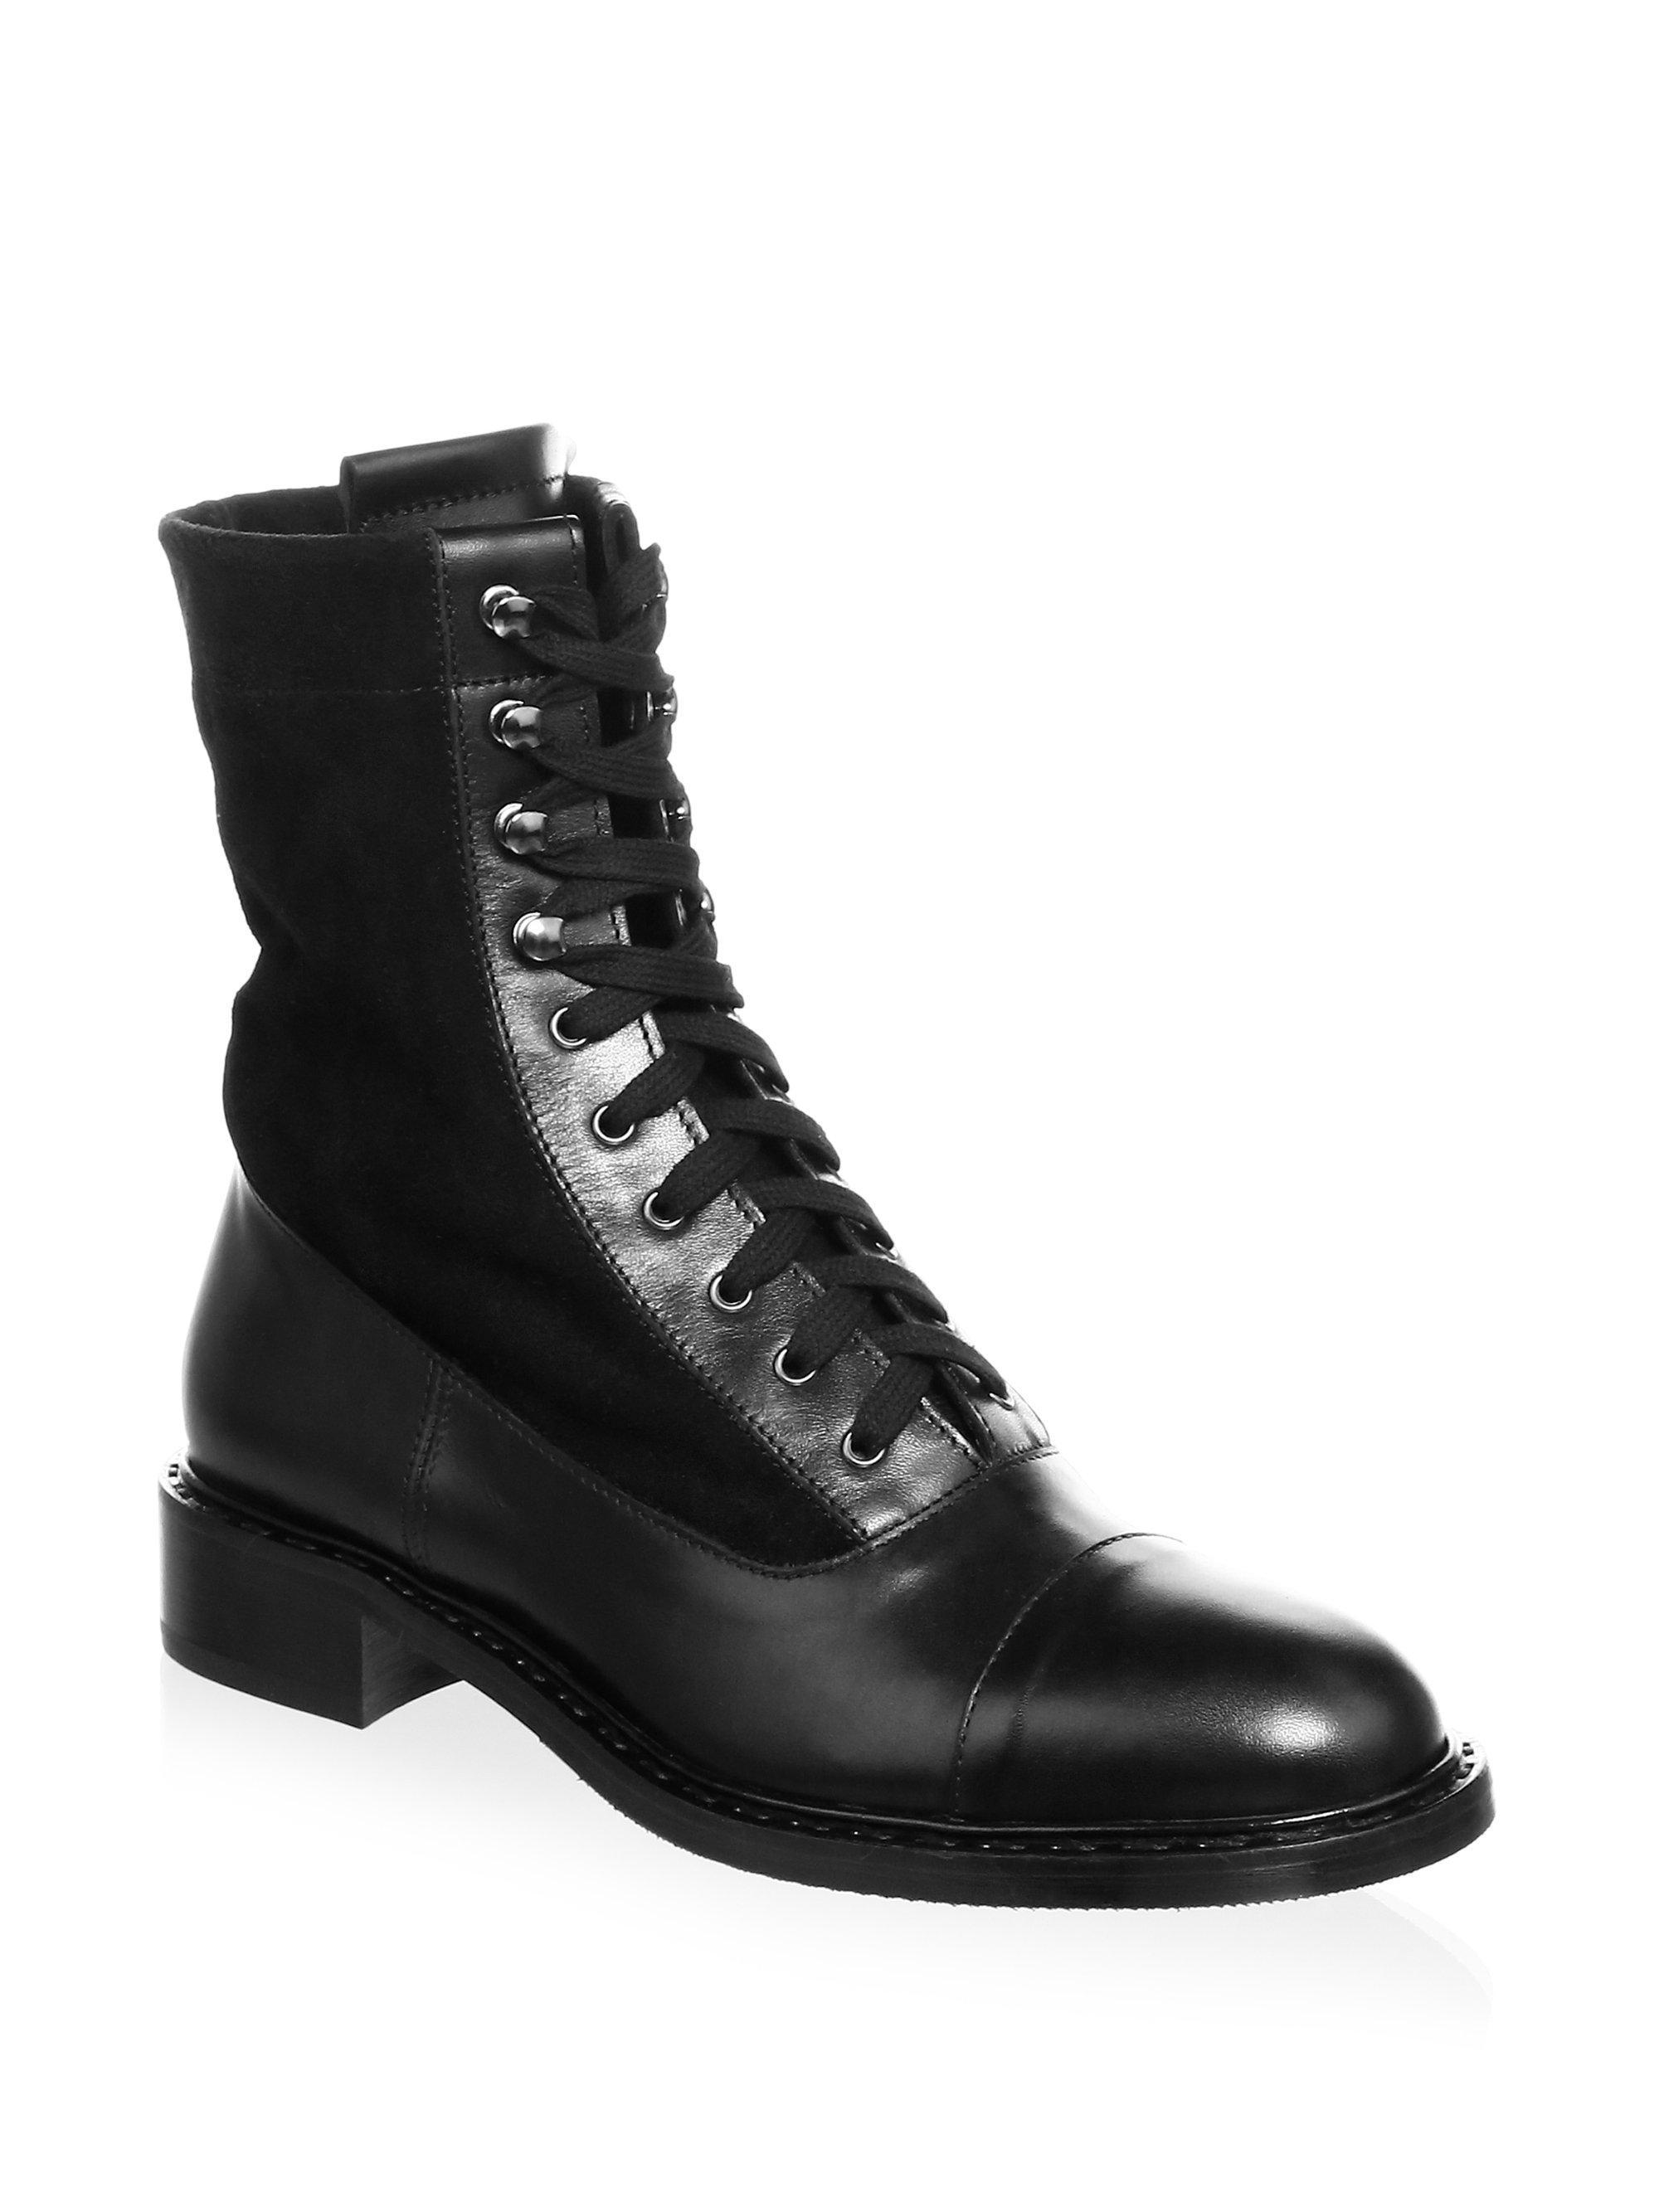 Aquatalia Brigitta Suede and Leather Lace-Up Boots 9Wdytt1nuF